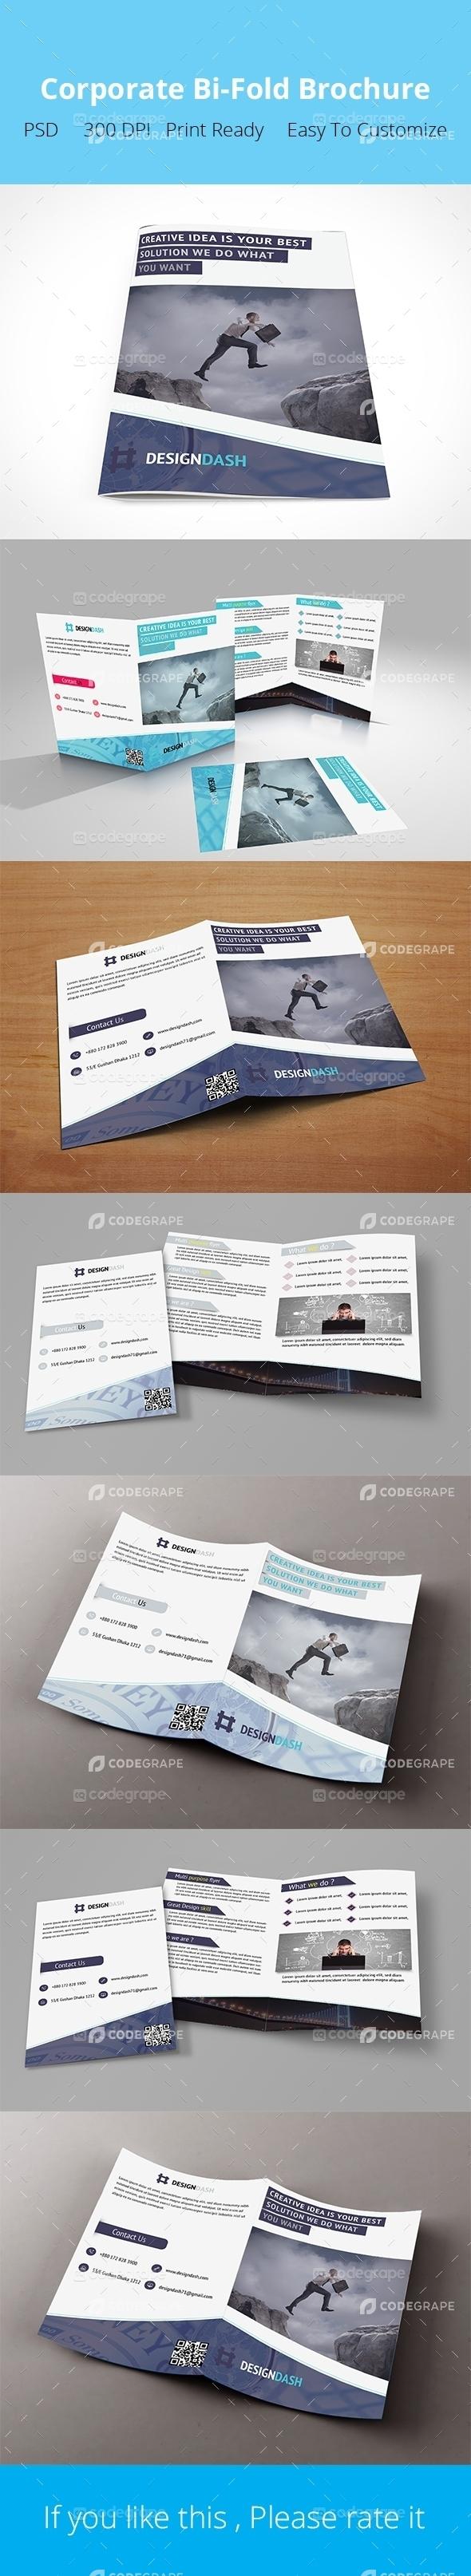 Design Agency Bi-Fold Brochure